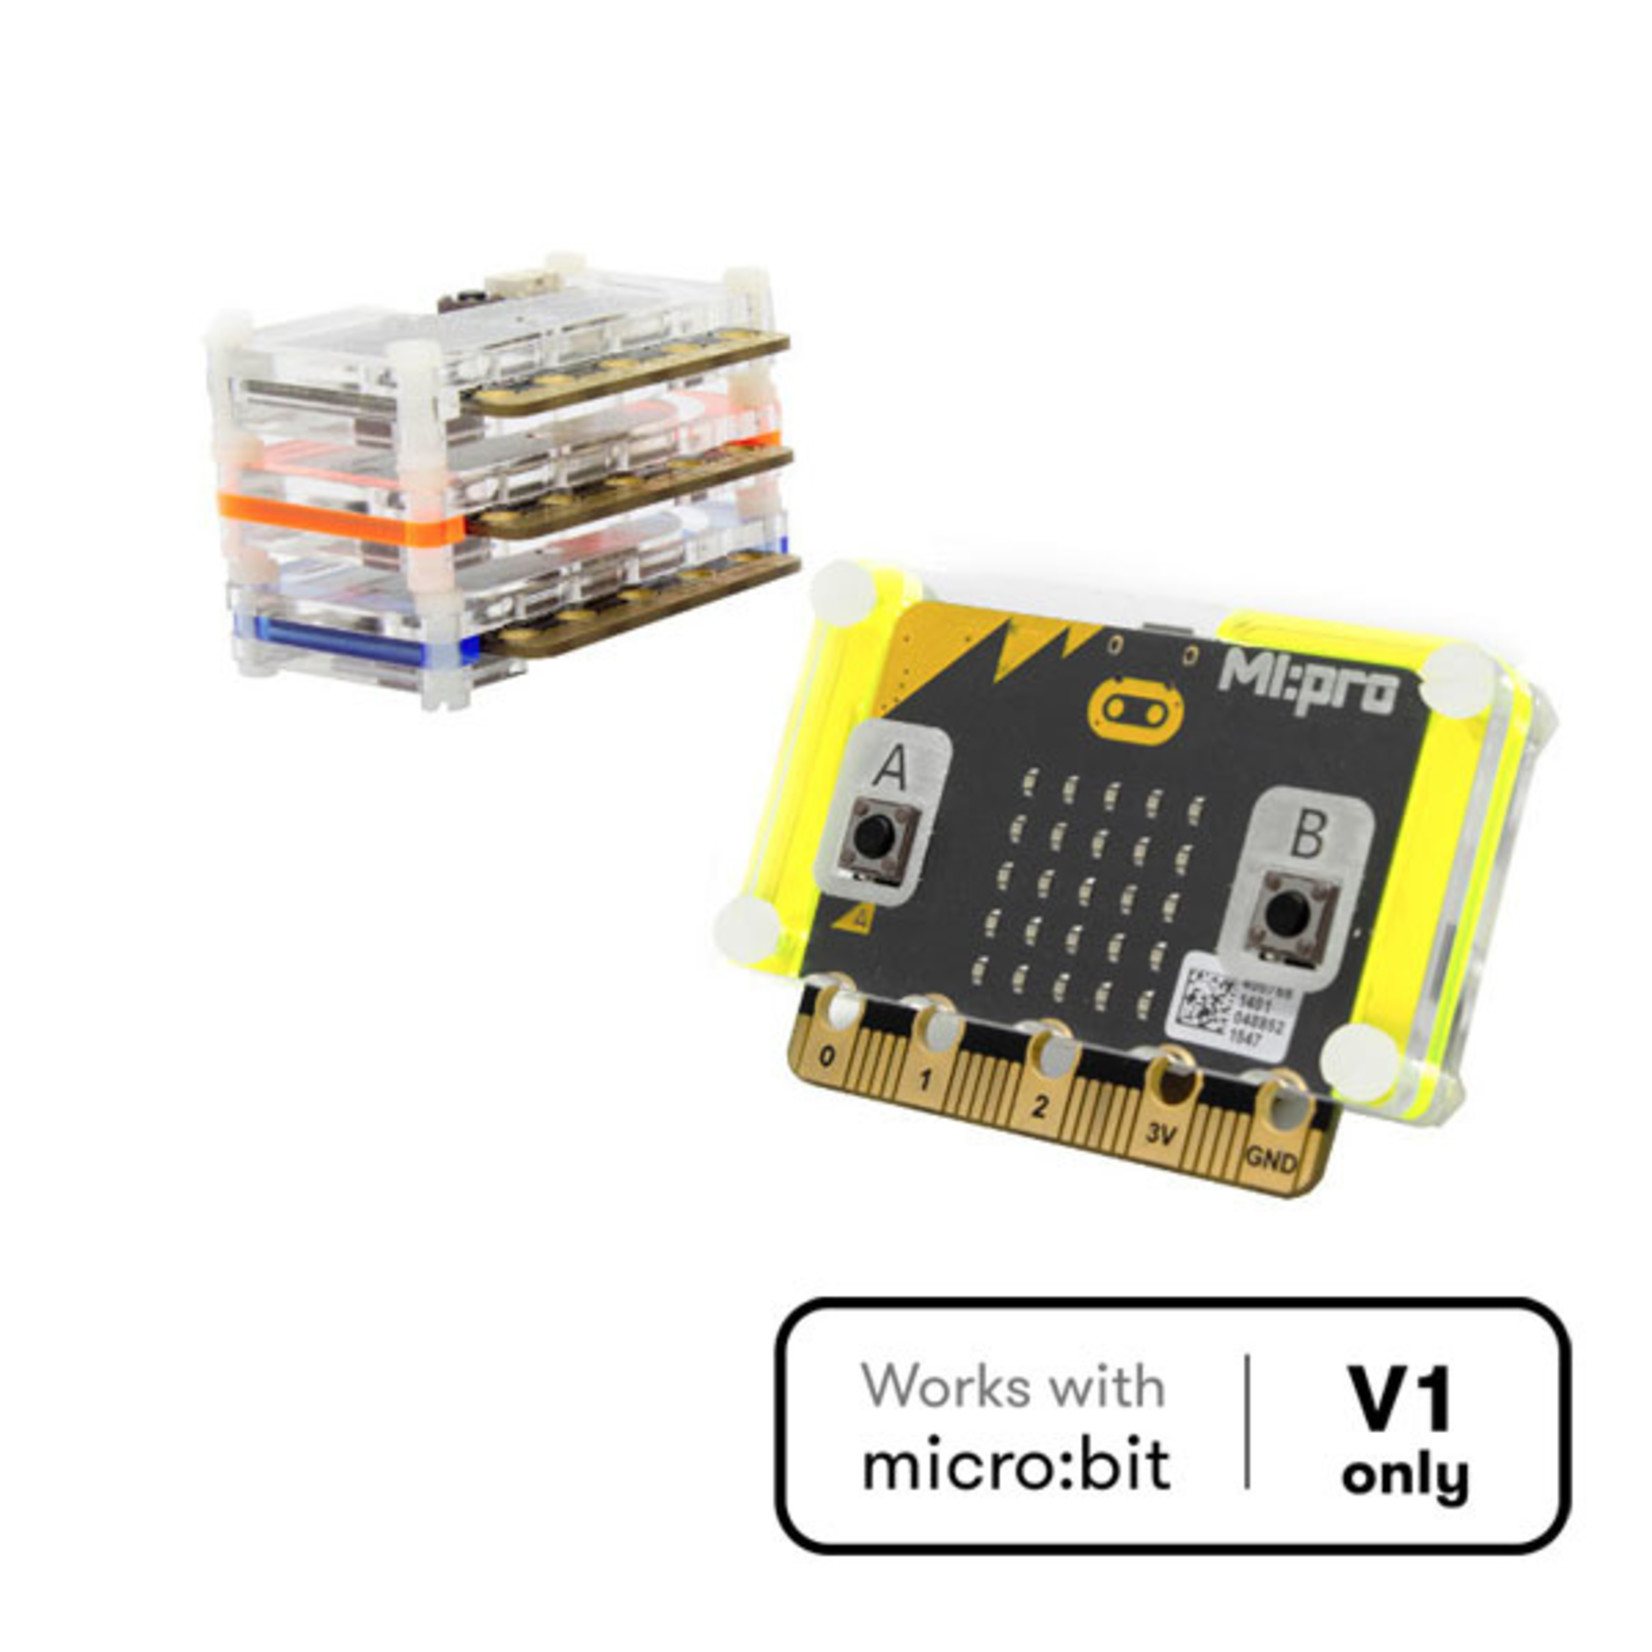 Kitronik MI:pro Protector Case for the BBC micro:bit - Clear